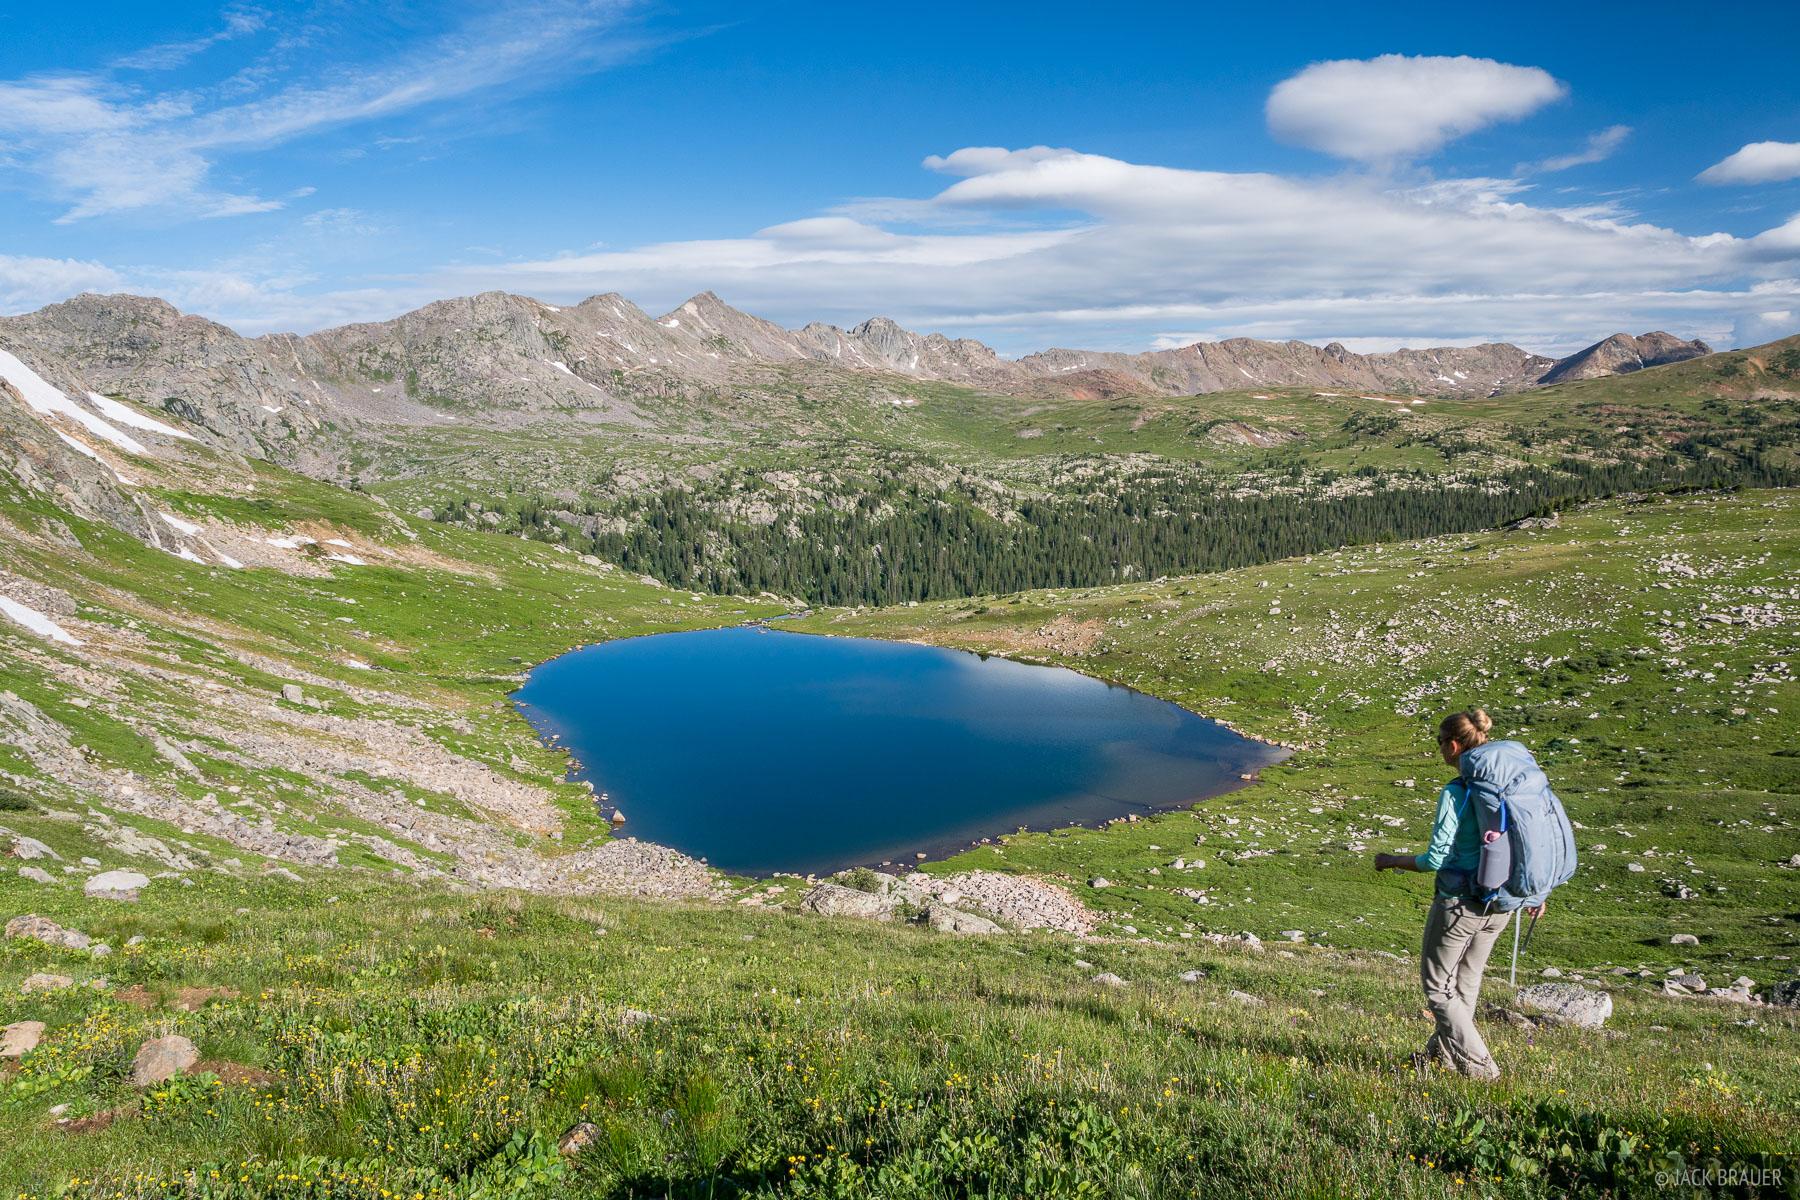 Colorado, Holy Cross Wilderness, Treasure Vault Lake, Sawatch Range, Missouri Pass, hiking, photo